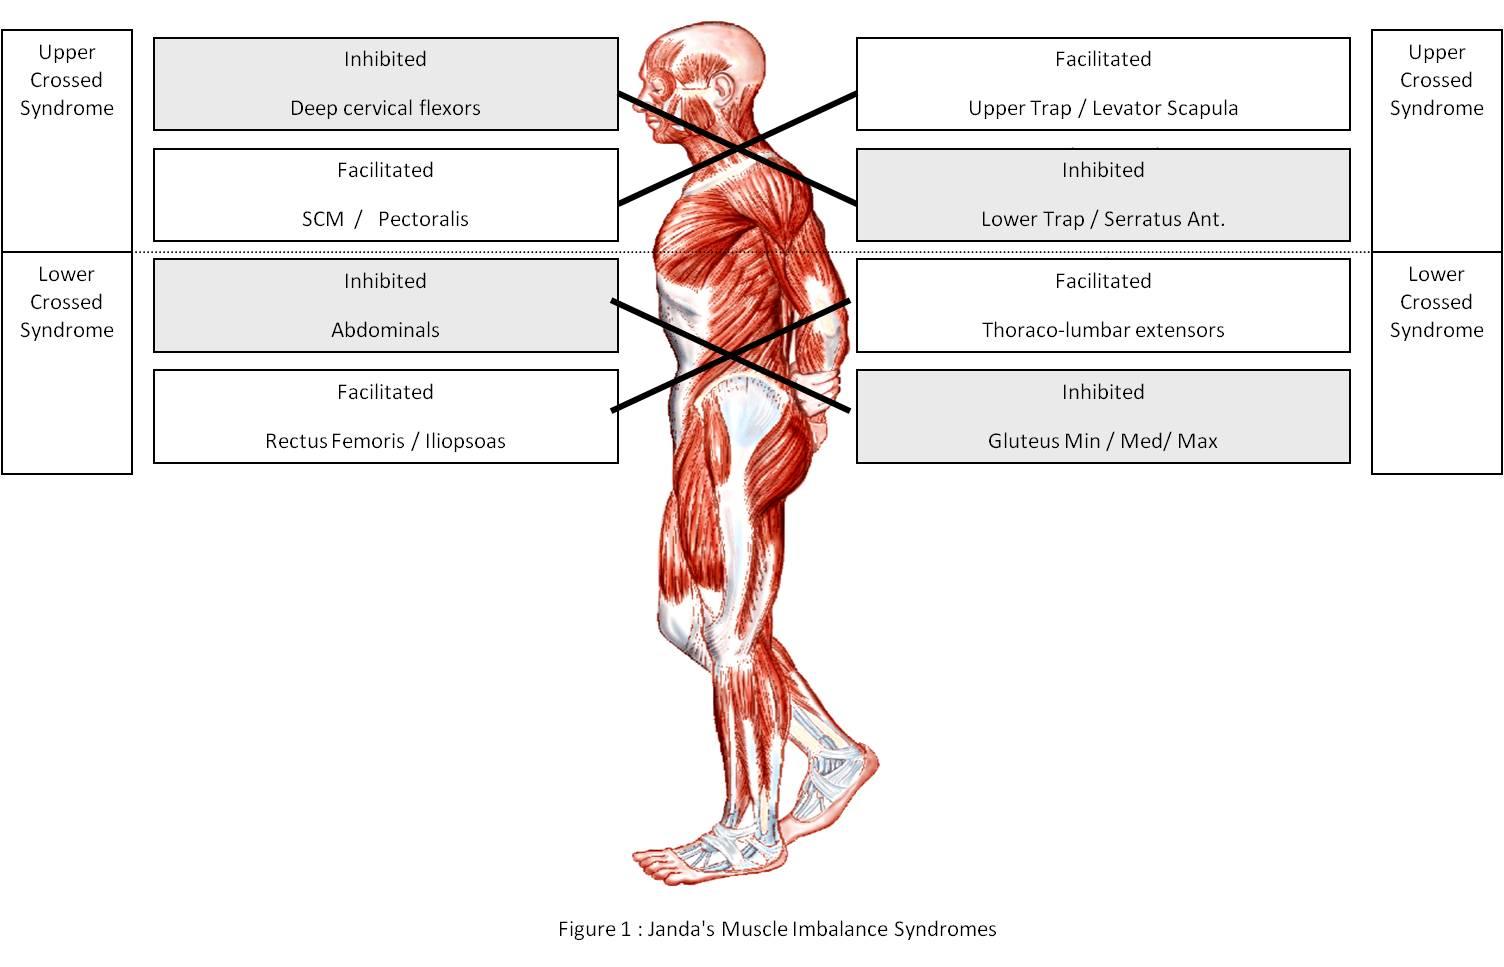 Janda Cross-Syndromes - Postural Syndrome